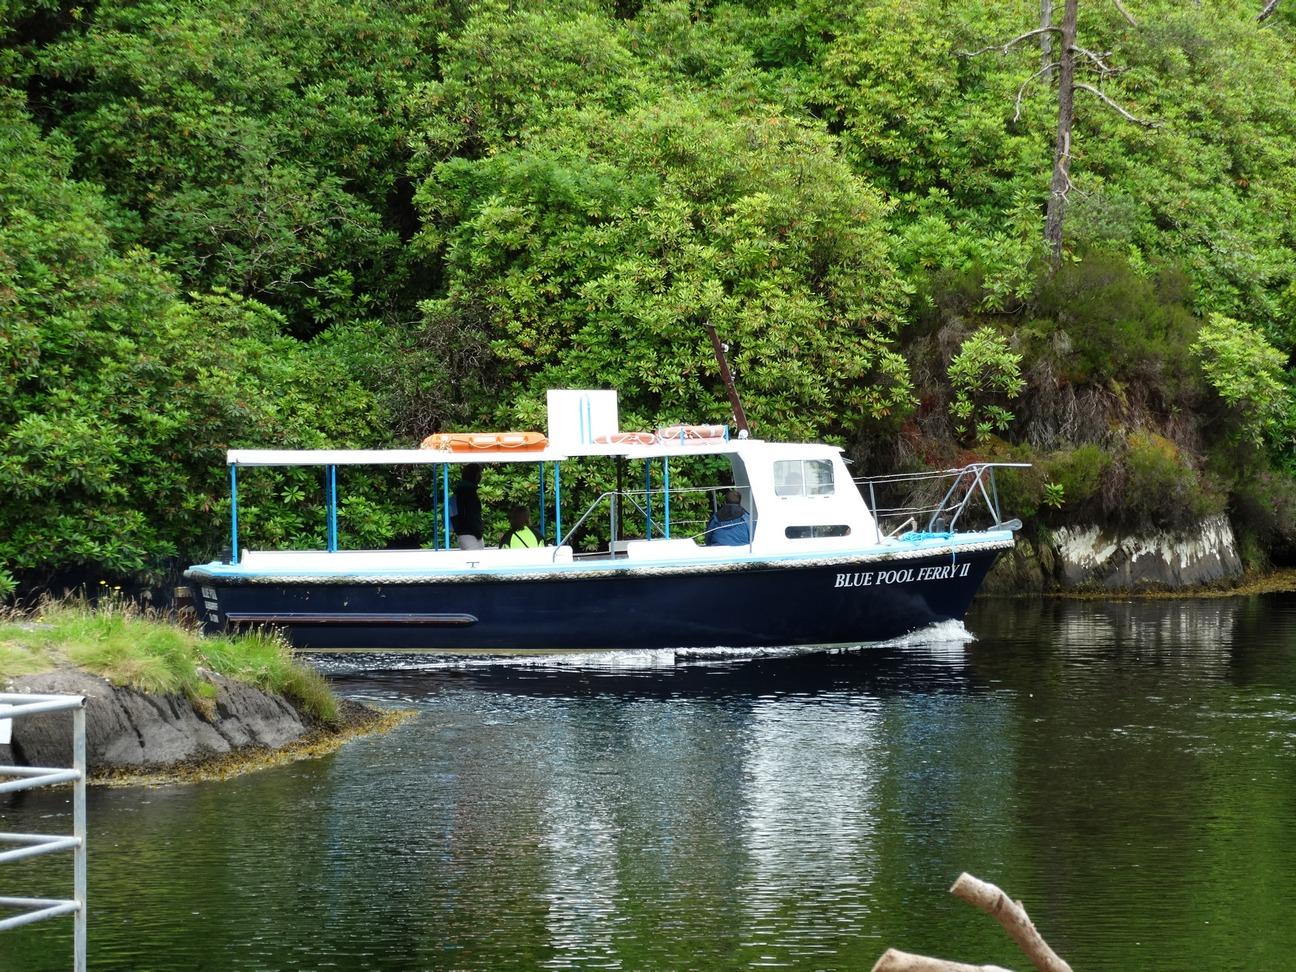 Blue Pool Ferry II